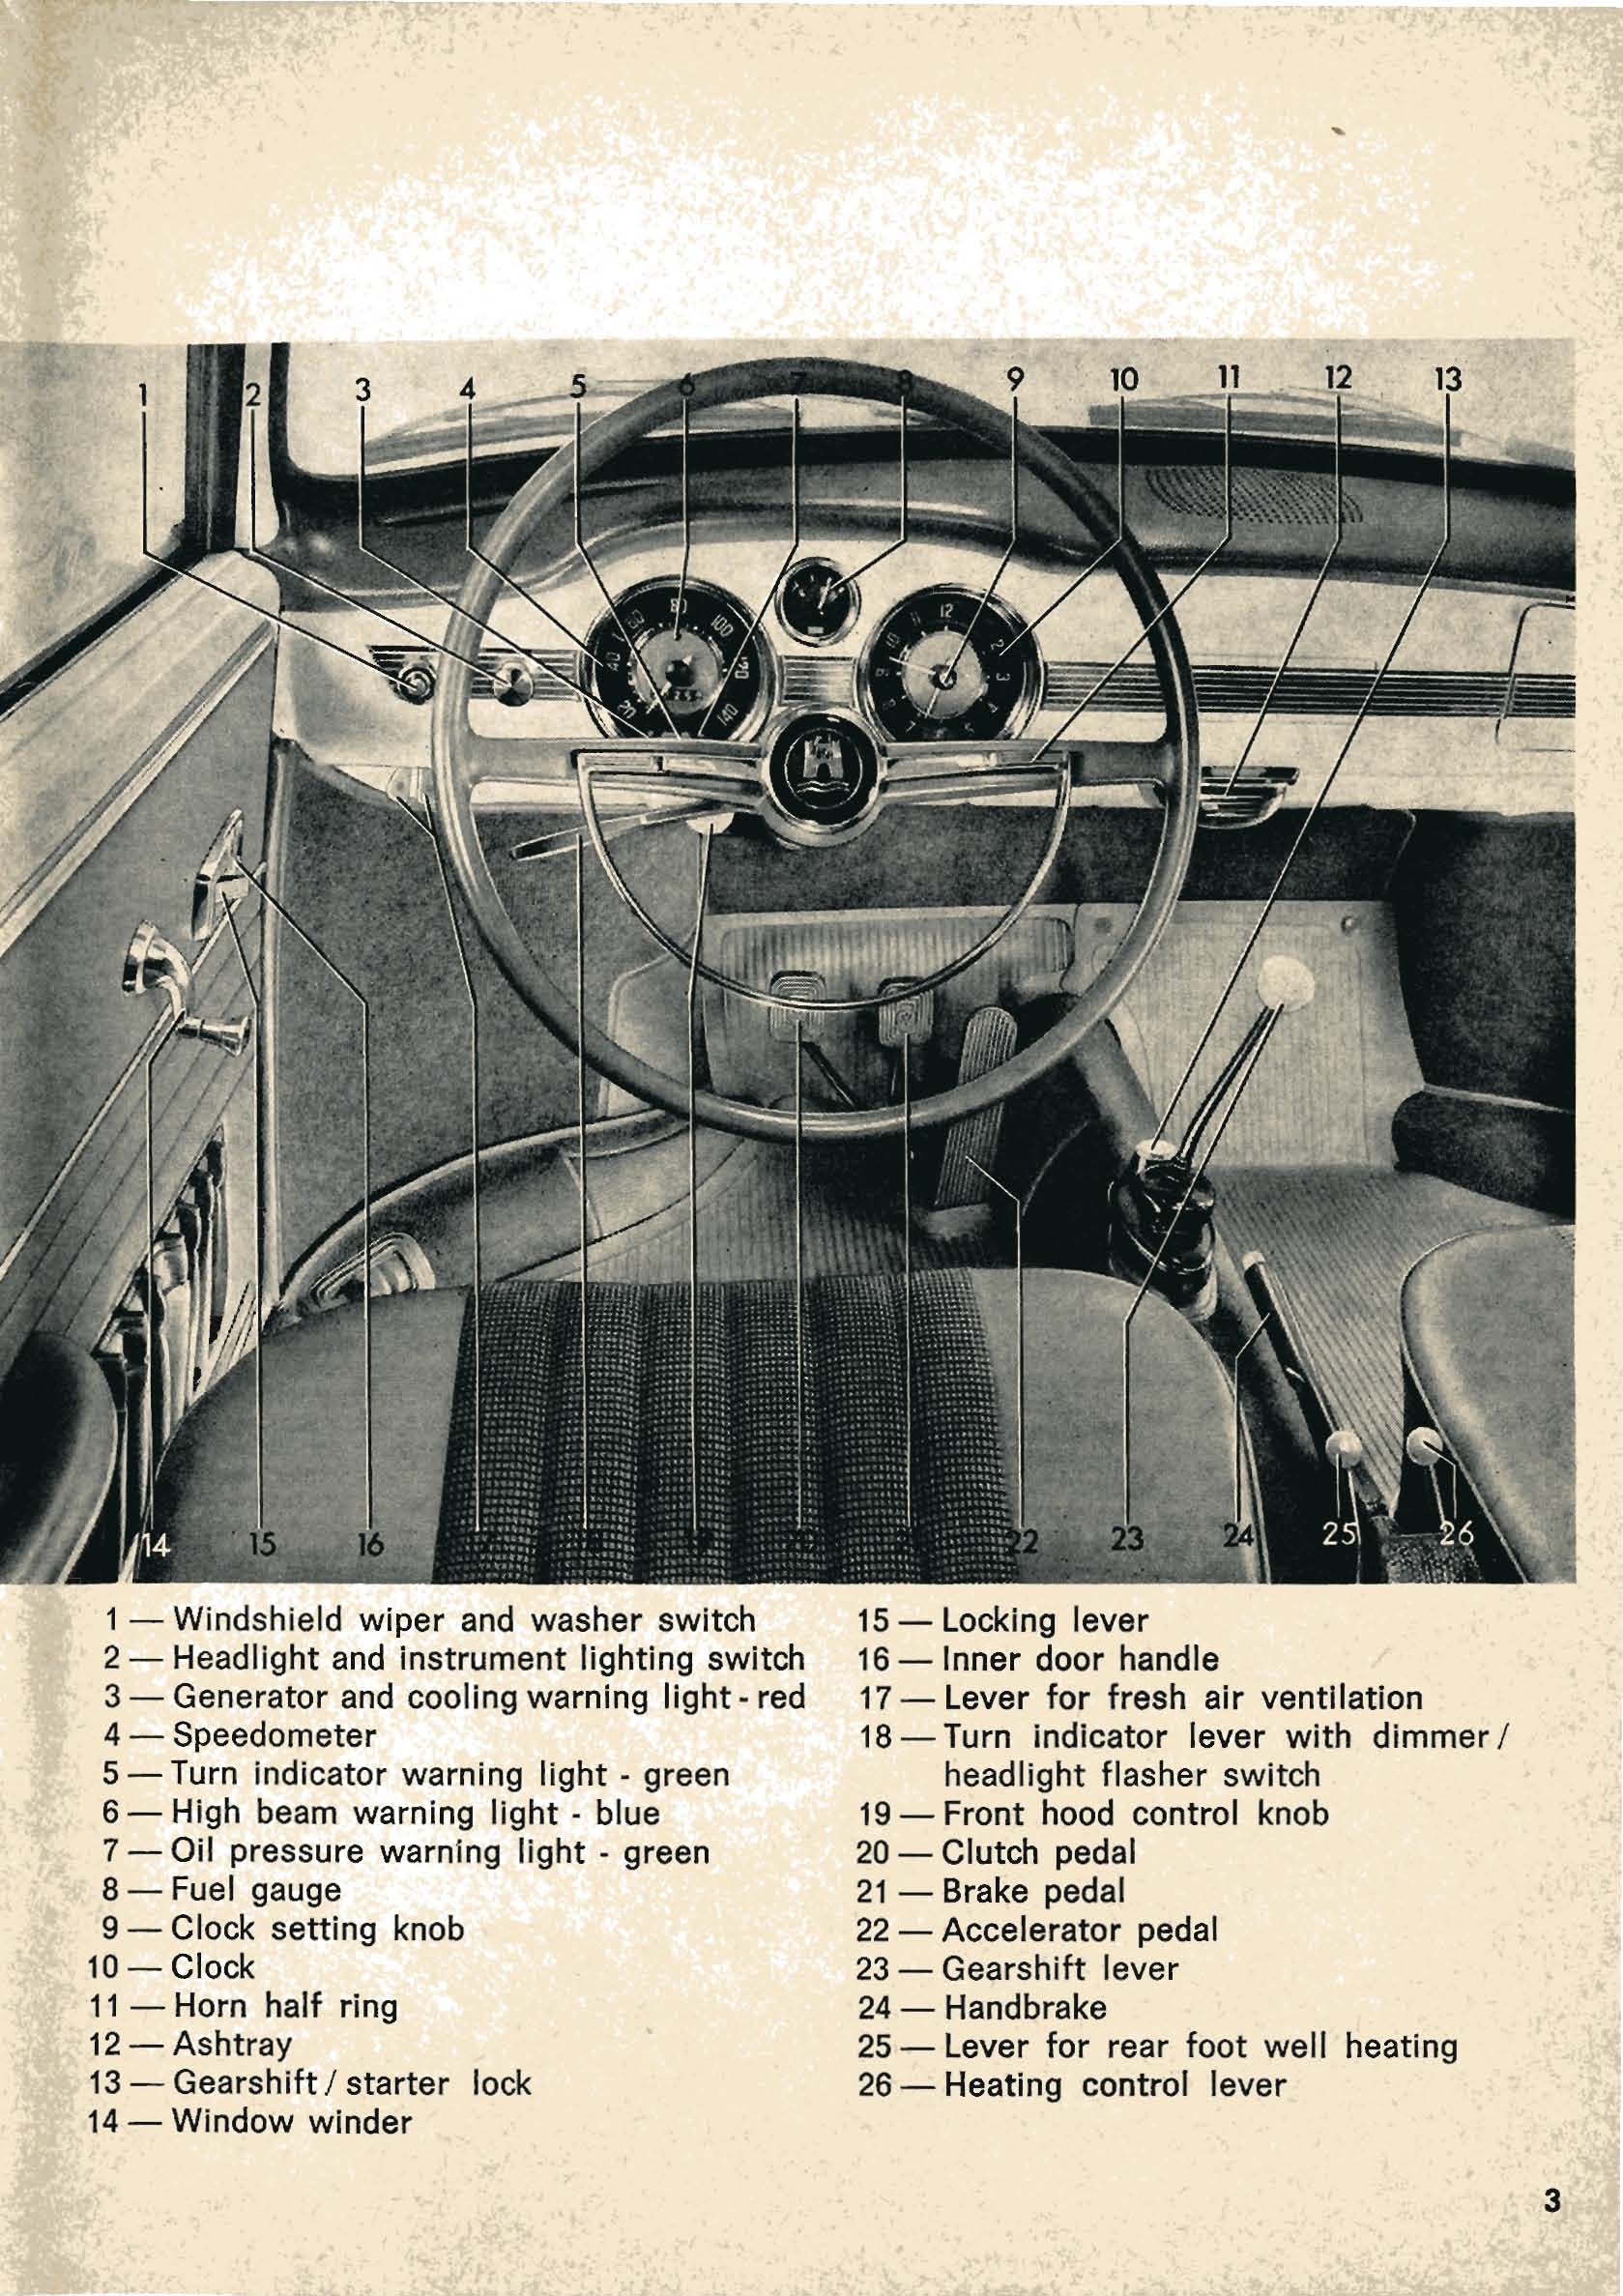 thesamba com august 1965 1966 model year vw karmann ghia rh thesamba com vw karmann ghia price guide vw karmann ghia service manual pdf